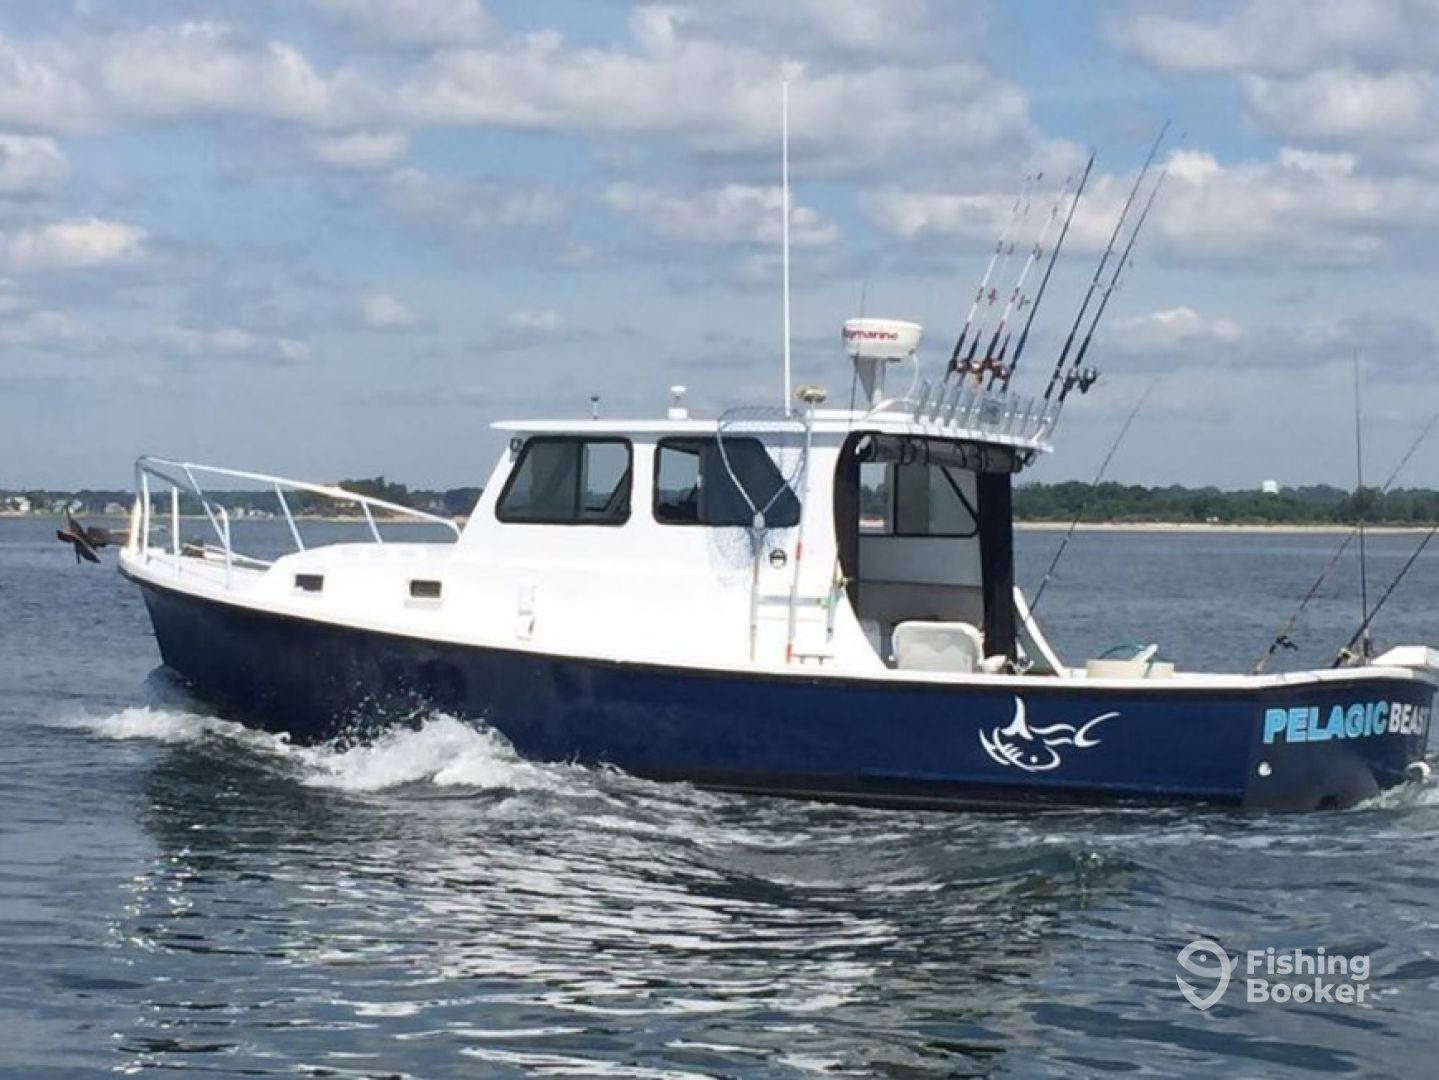 Pelagic beast fishing charters llc norwalk ct for Ct fishing charters